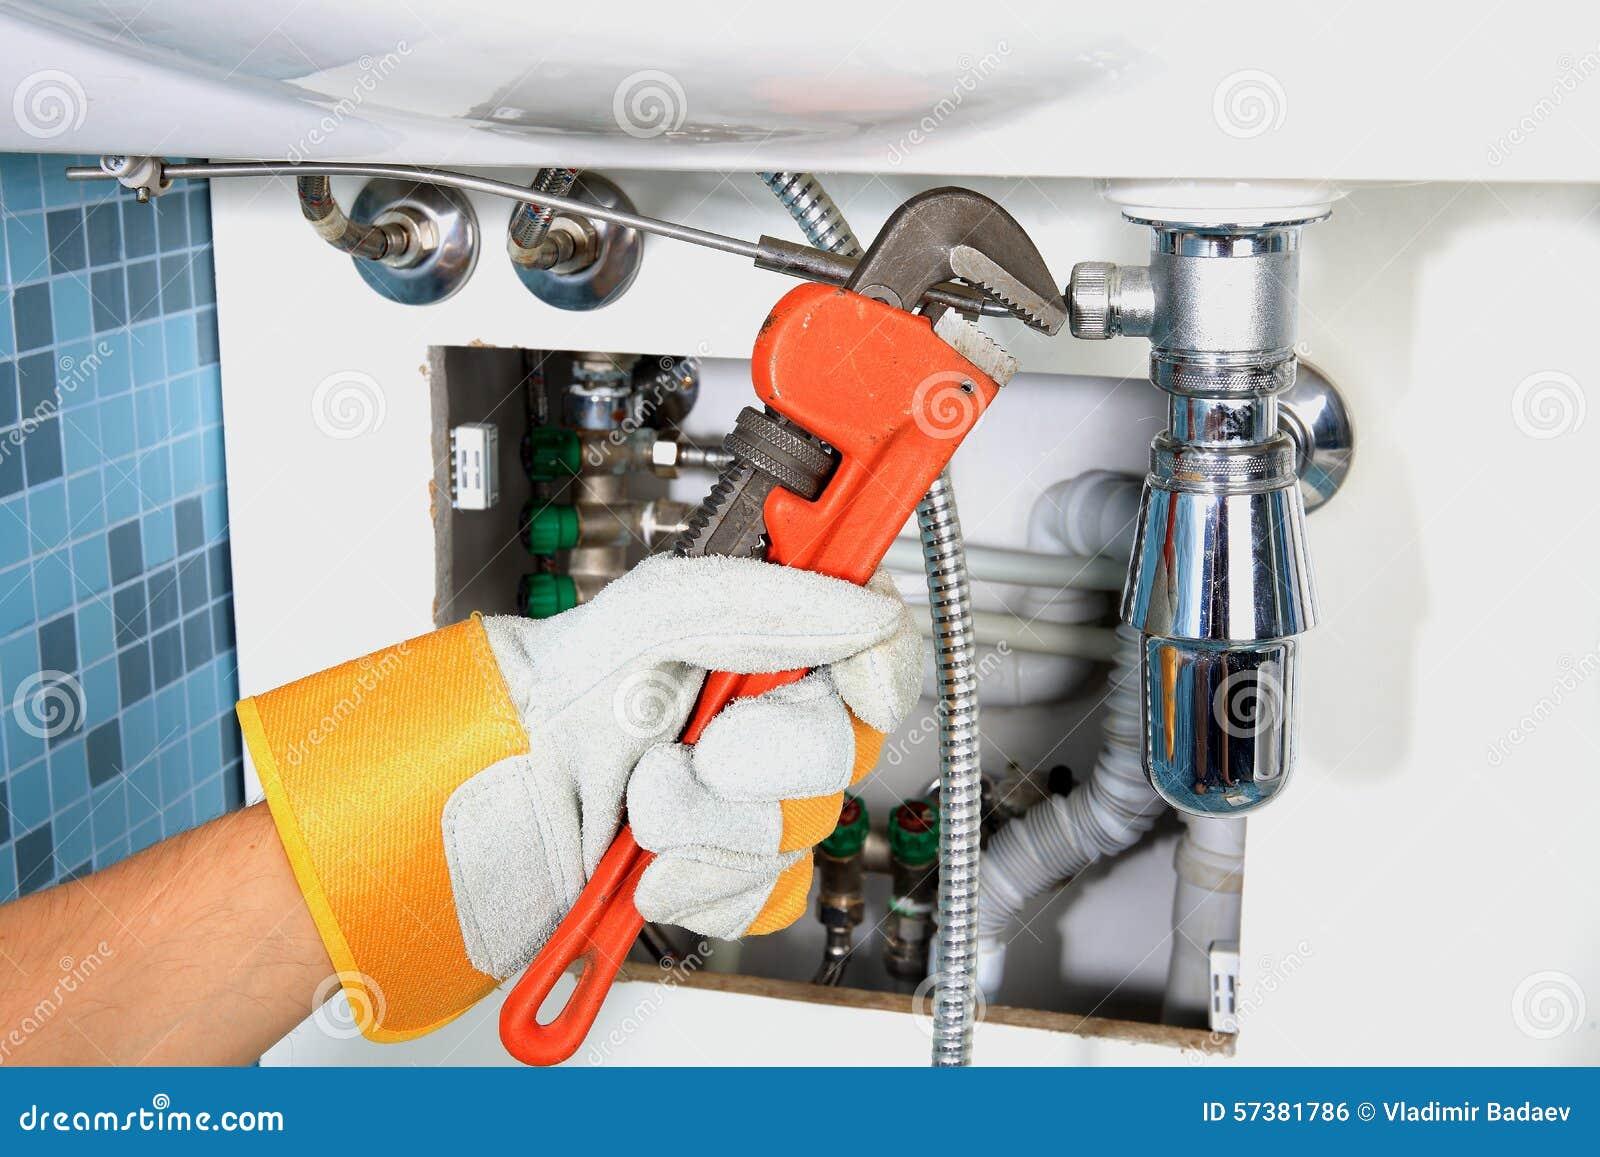 Plumbing Work And Sanitary Engineering Stock Photo - Image of pipe ...